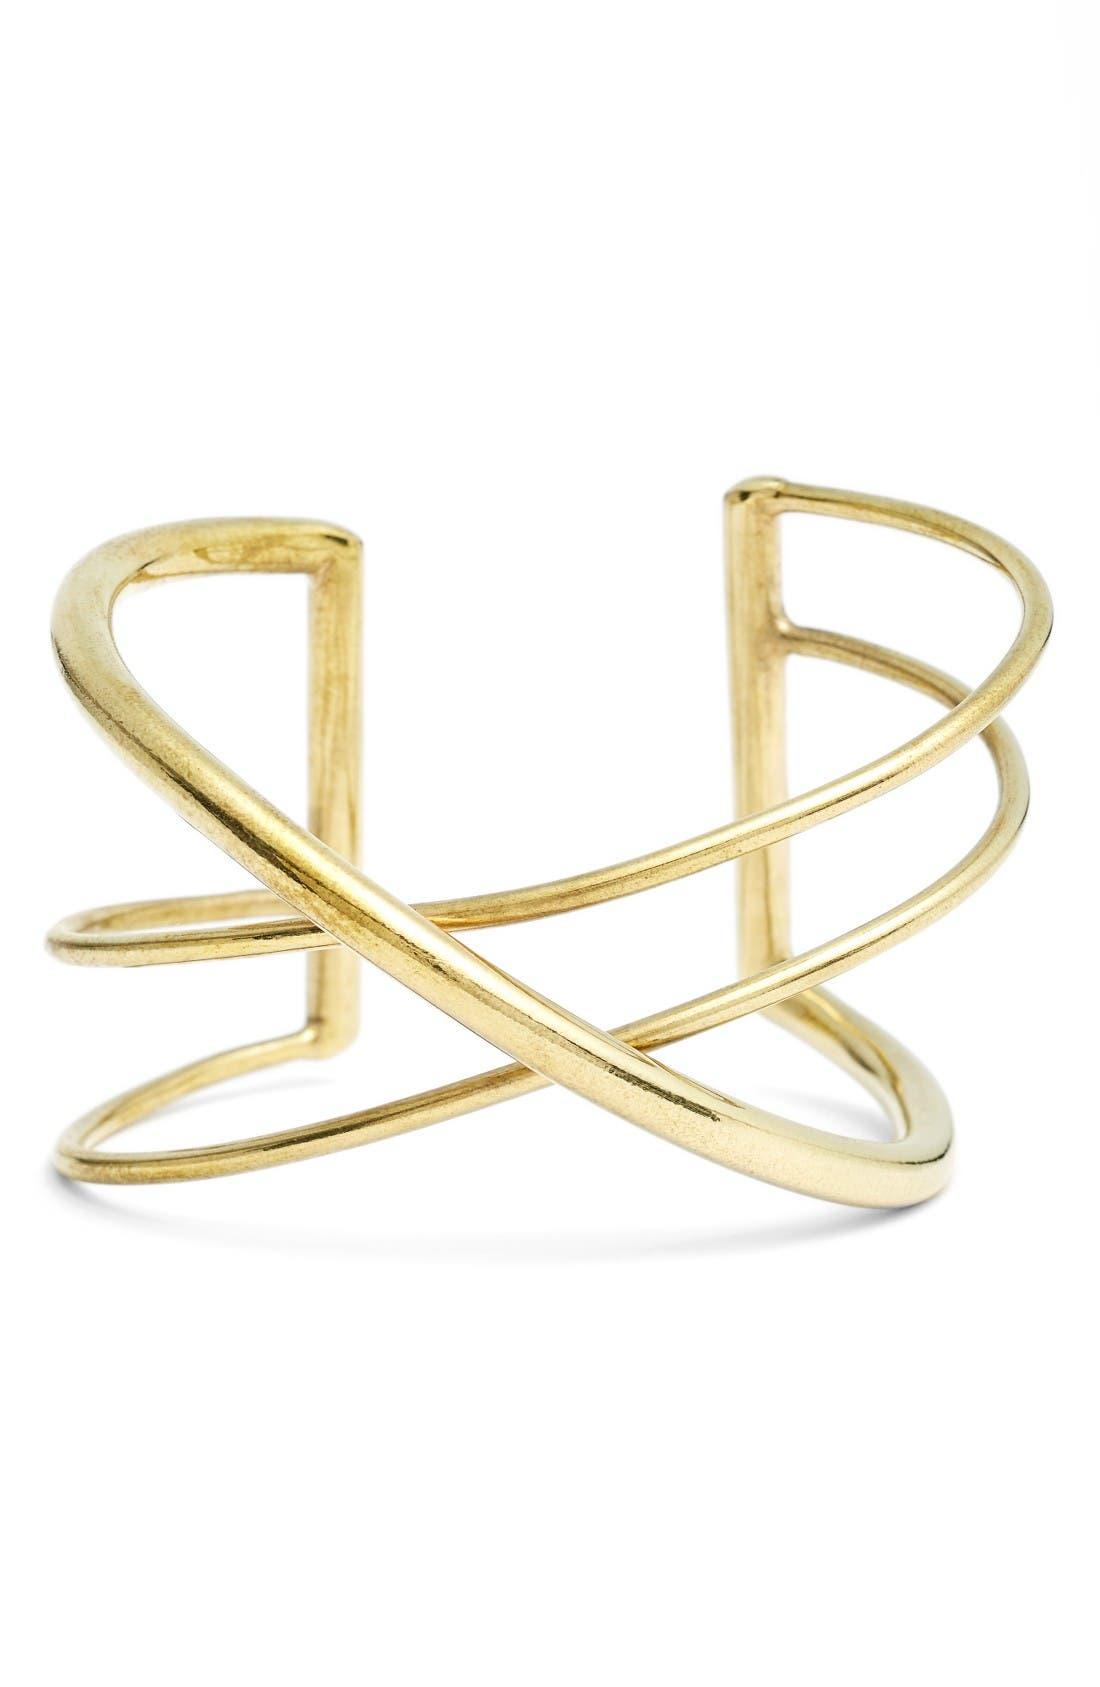 Alternate Image 1 Selected - Soko Double Cross Cuff